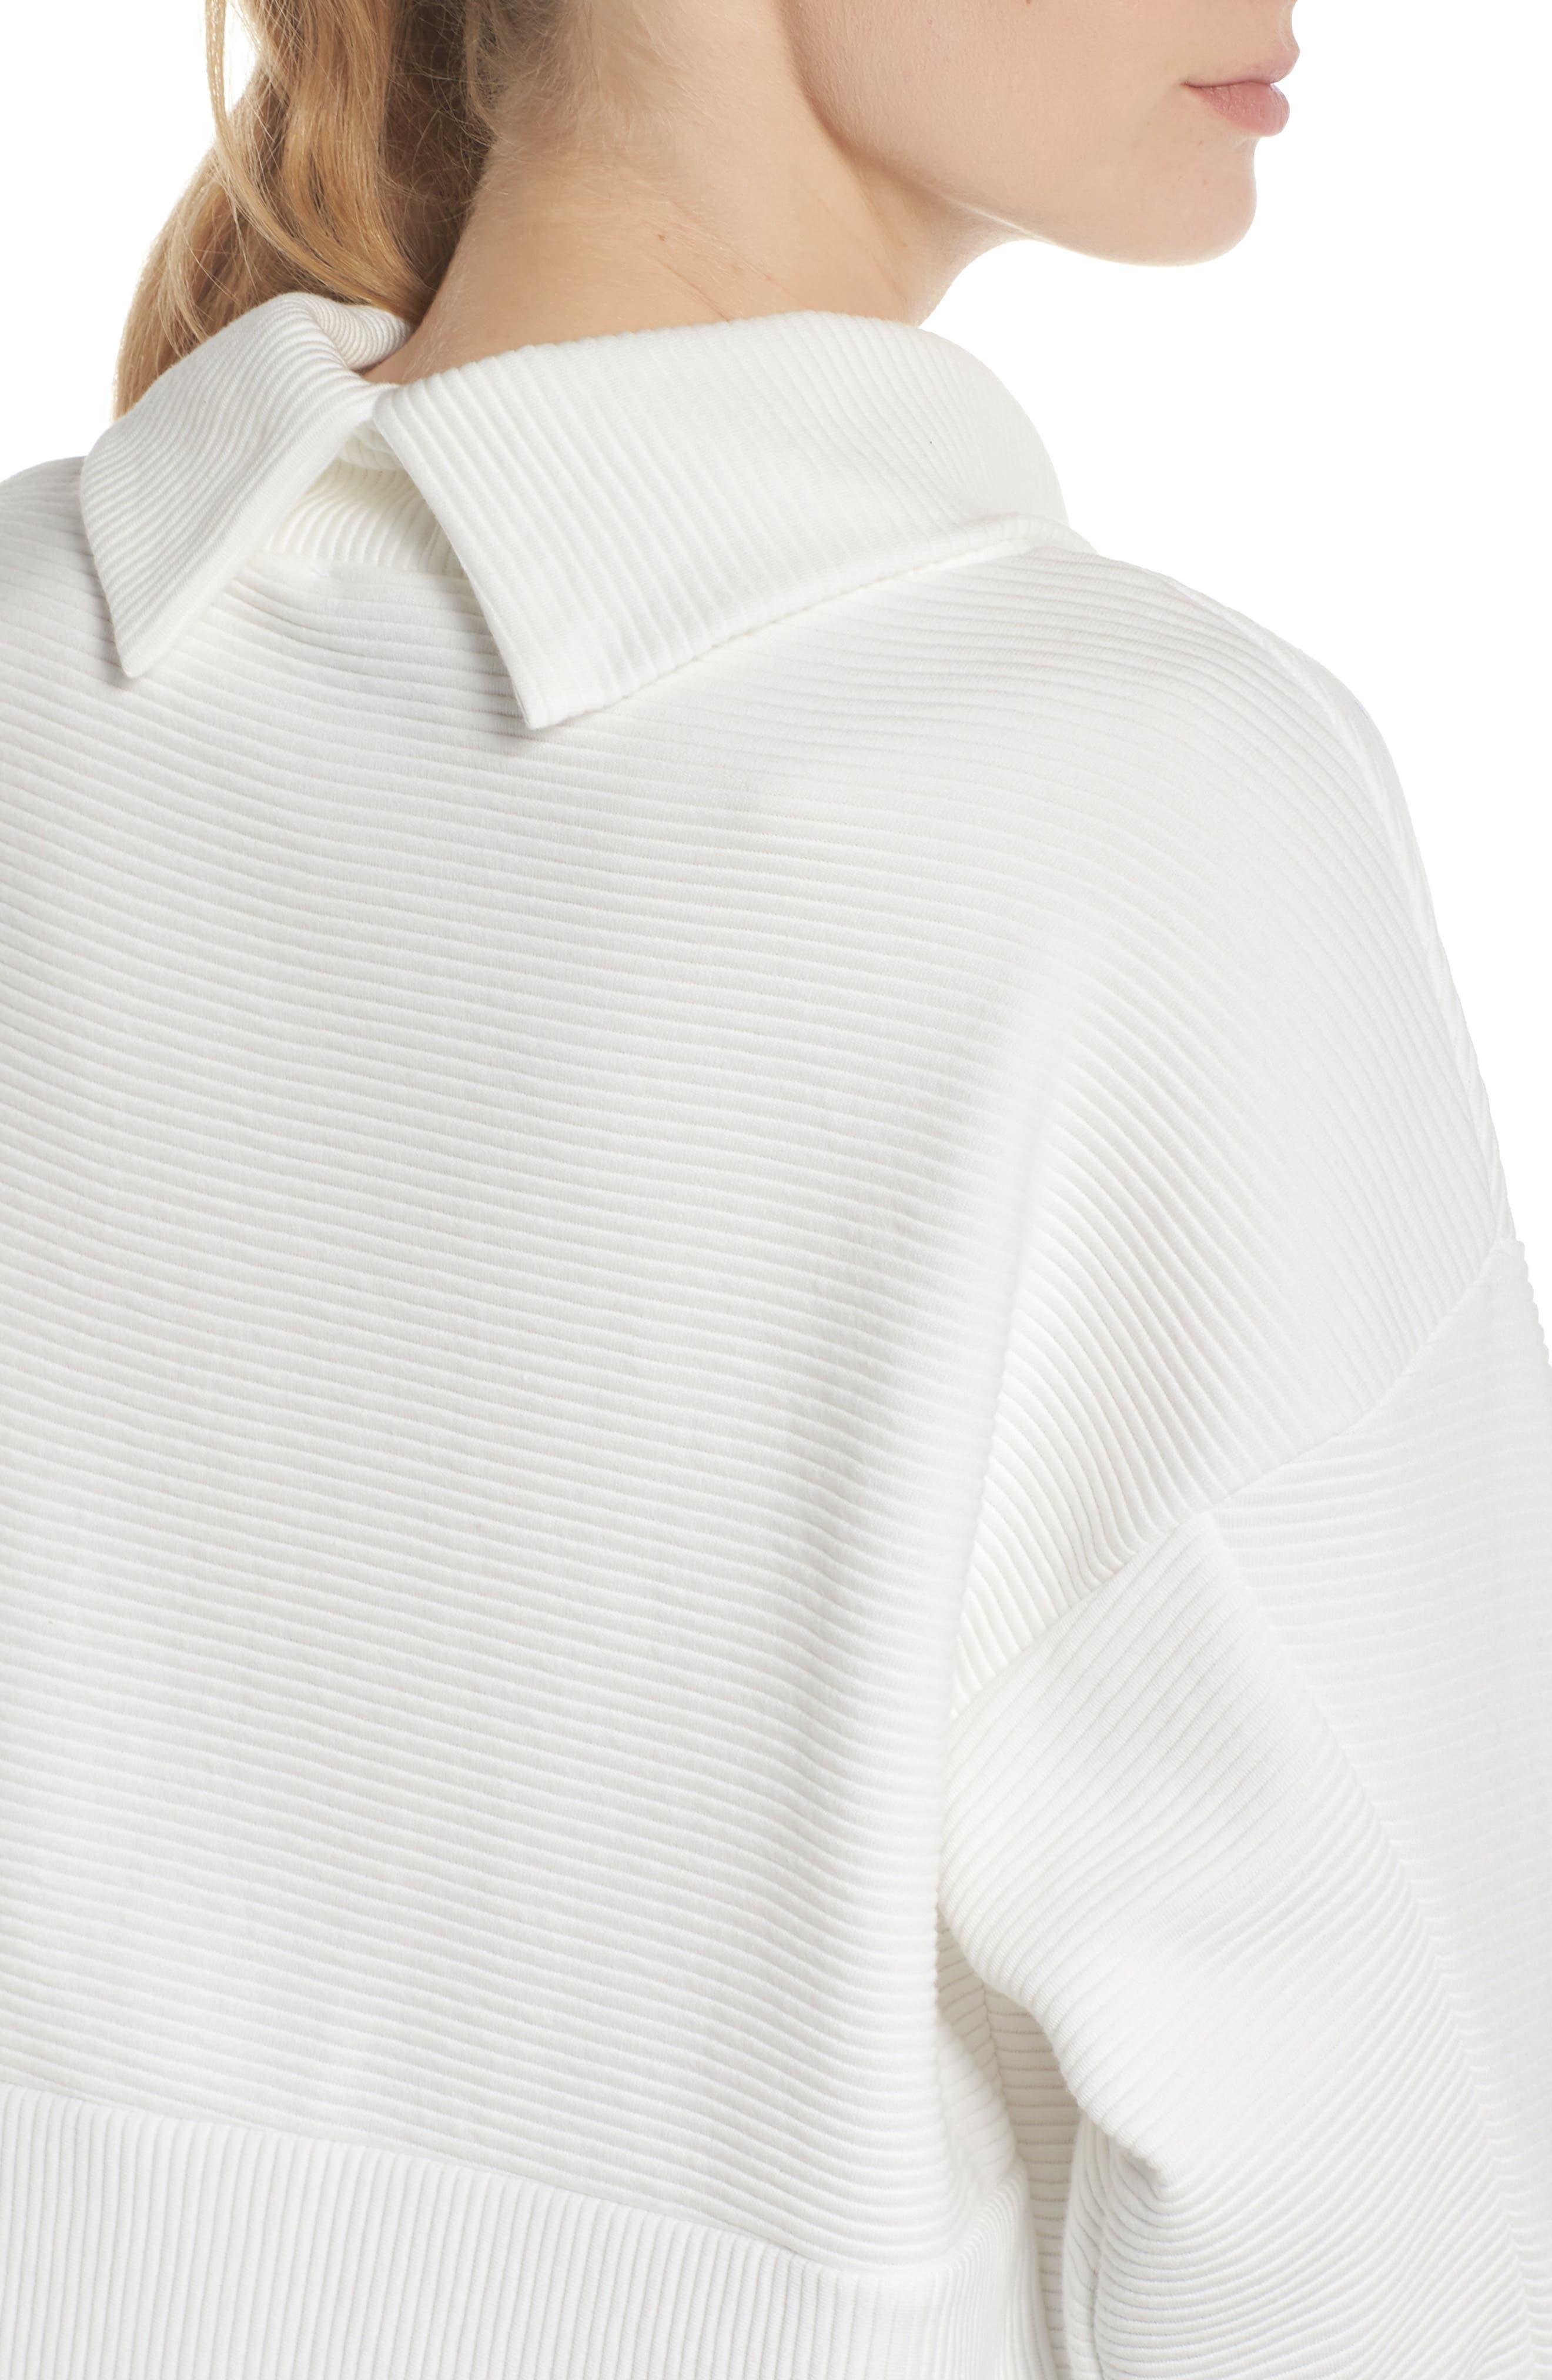 Whittier Sweatshirt,                             Alternate thumbnail 4, color,                             100